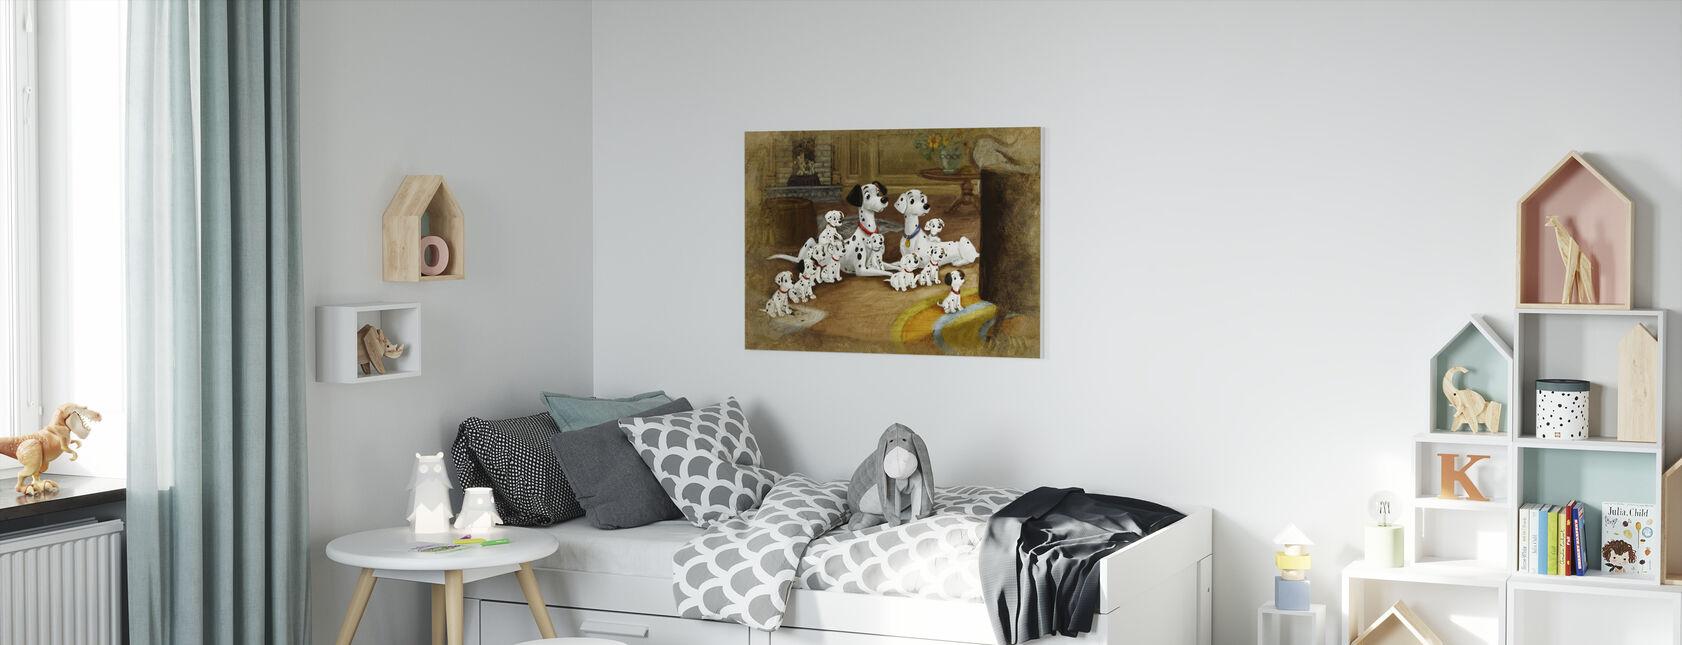 Disney Classics - 101 Dalmatians - Canvastaulu - Lastenhuone